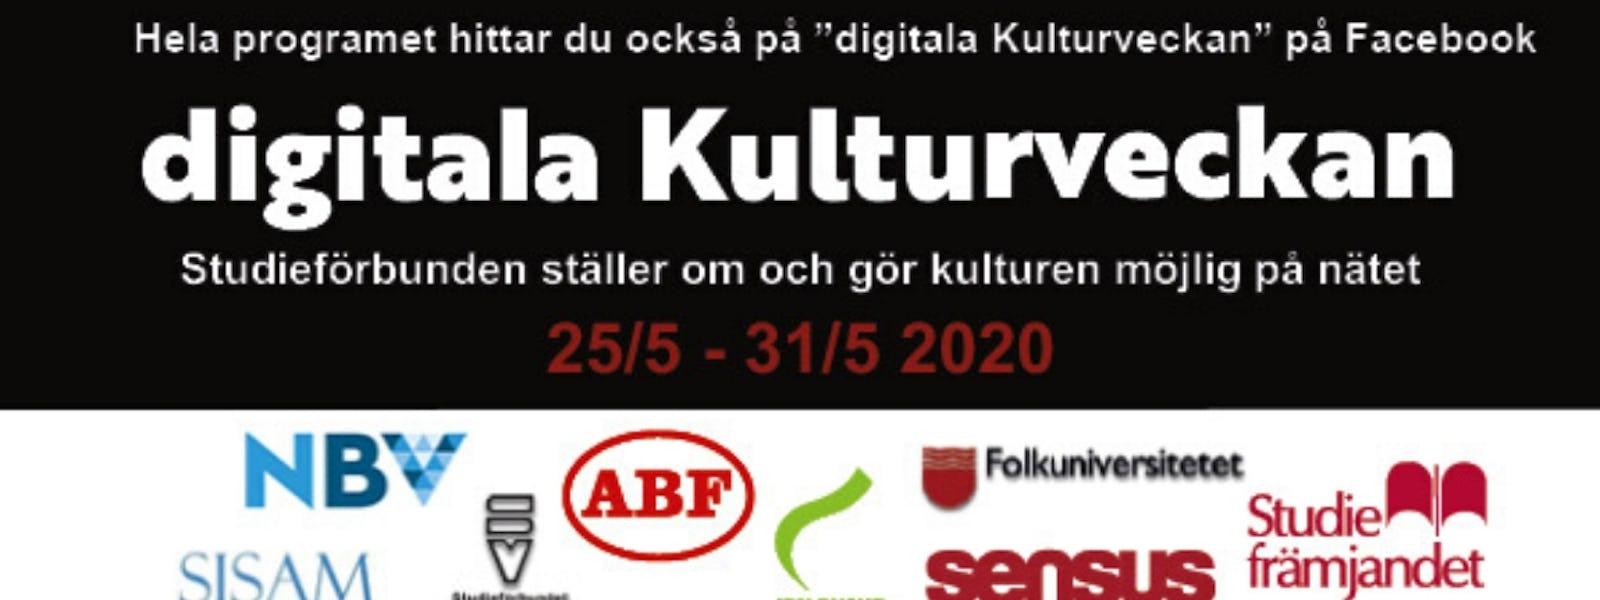 Bild - Digitala Kulturveckan!